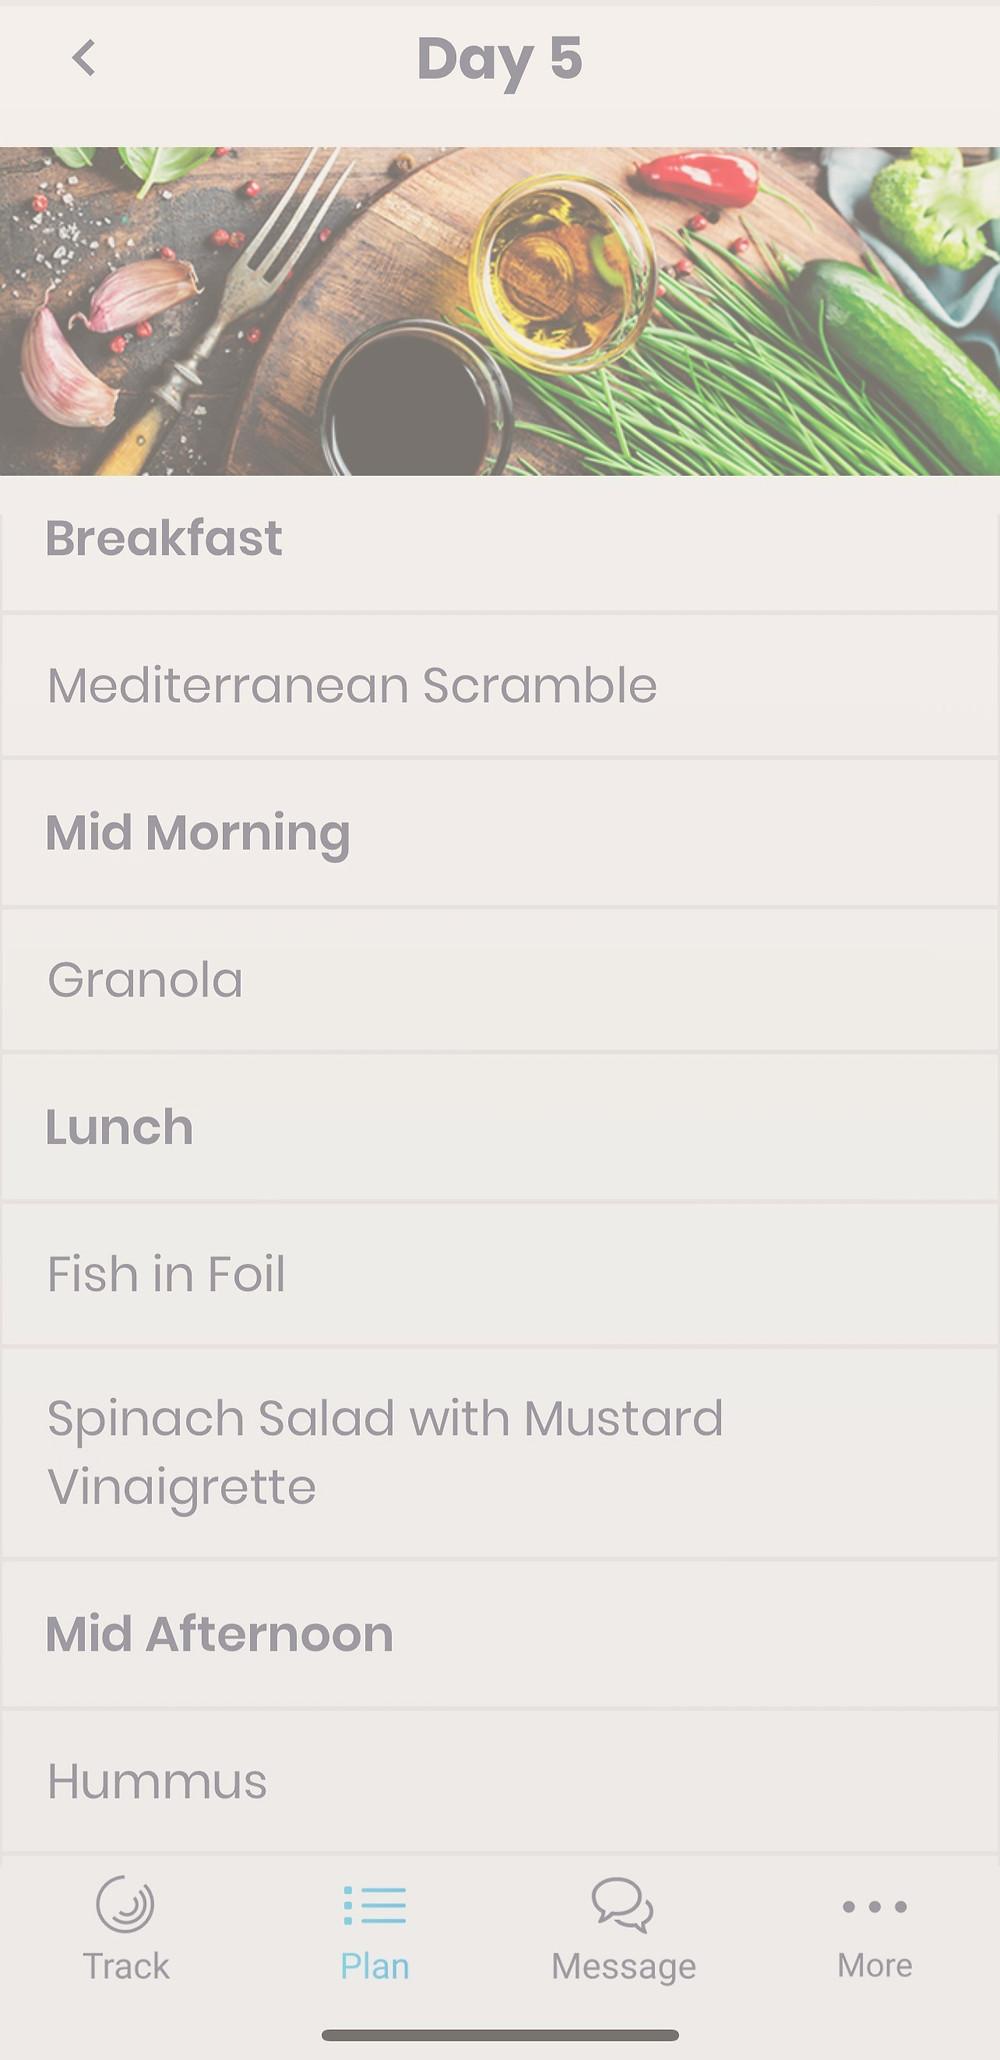 Holistic Health Meal Plan